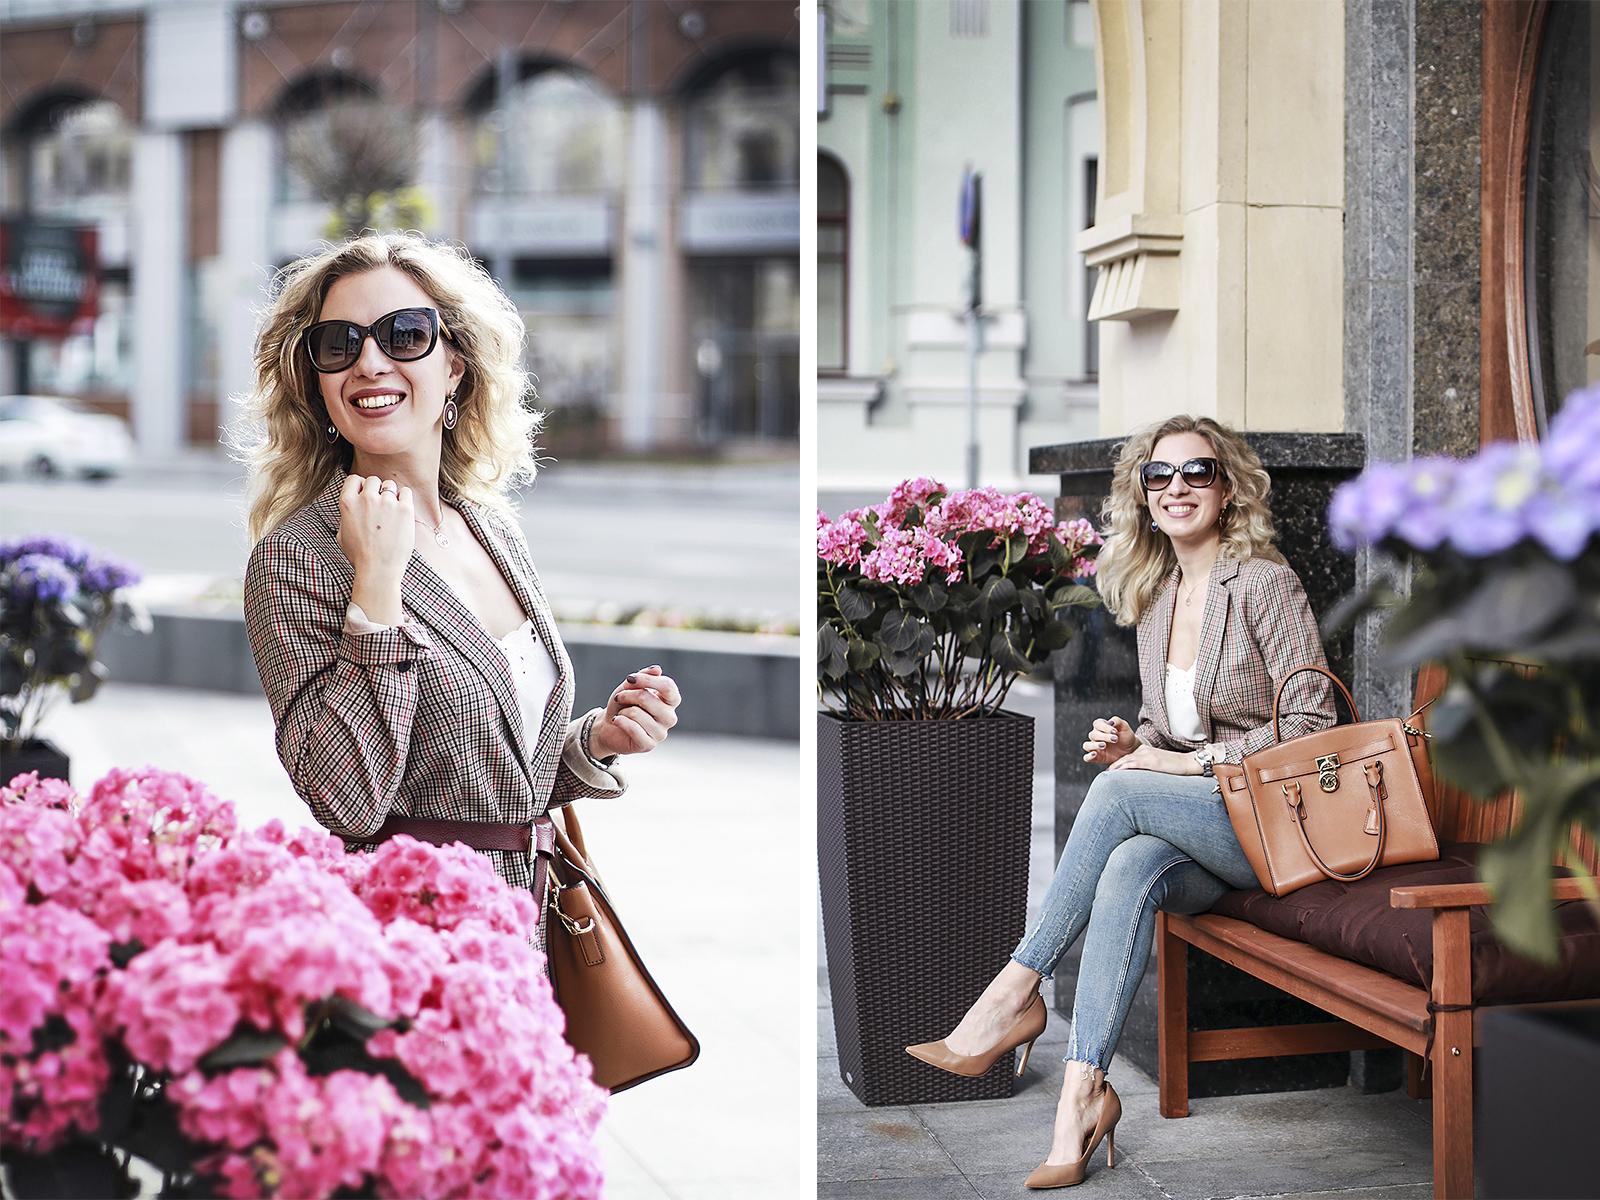 Rita_maslova_belt_jacket_trend2017_skinny_zara_jeans_nude_sam_edelman_shoes_Michael_Kors_bag_hamilton_classic_outfit_